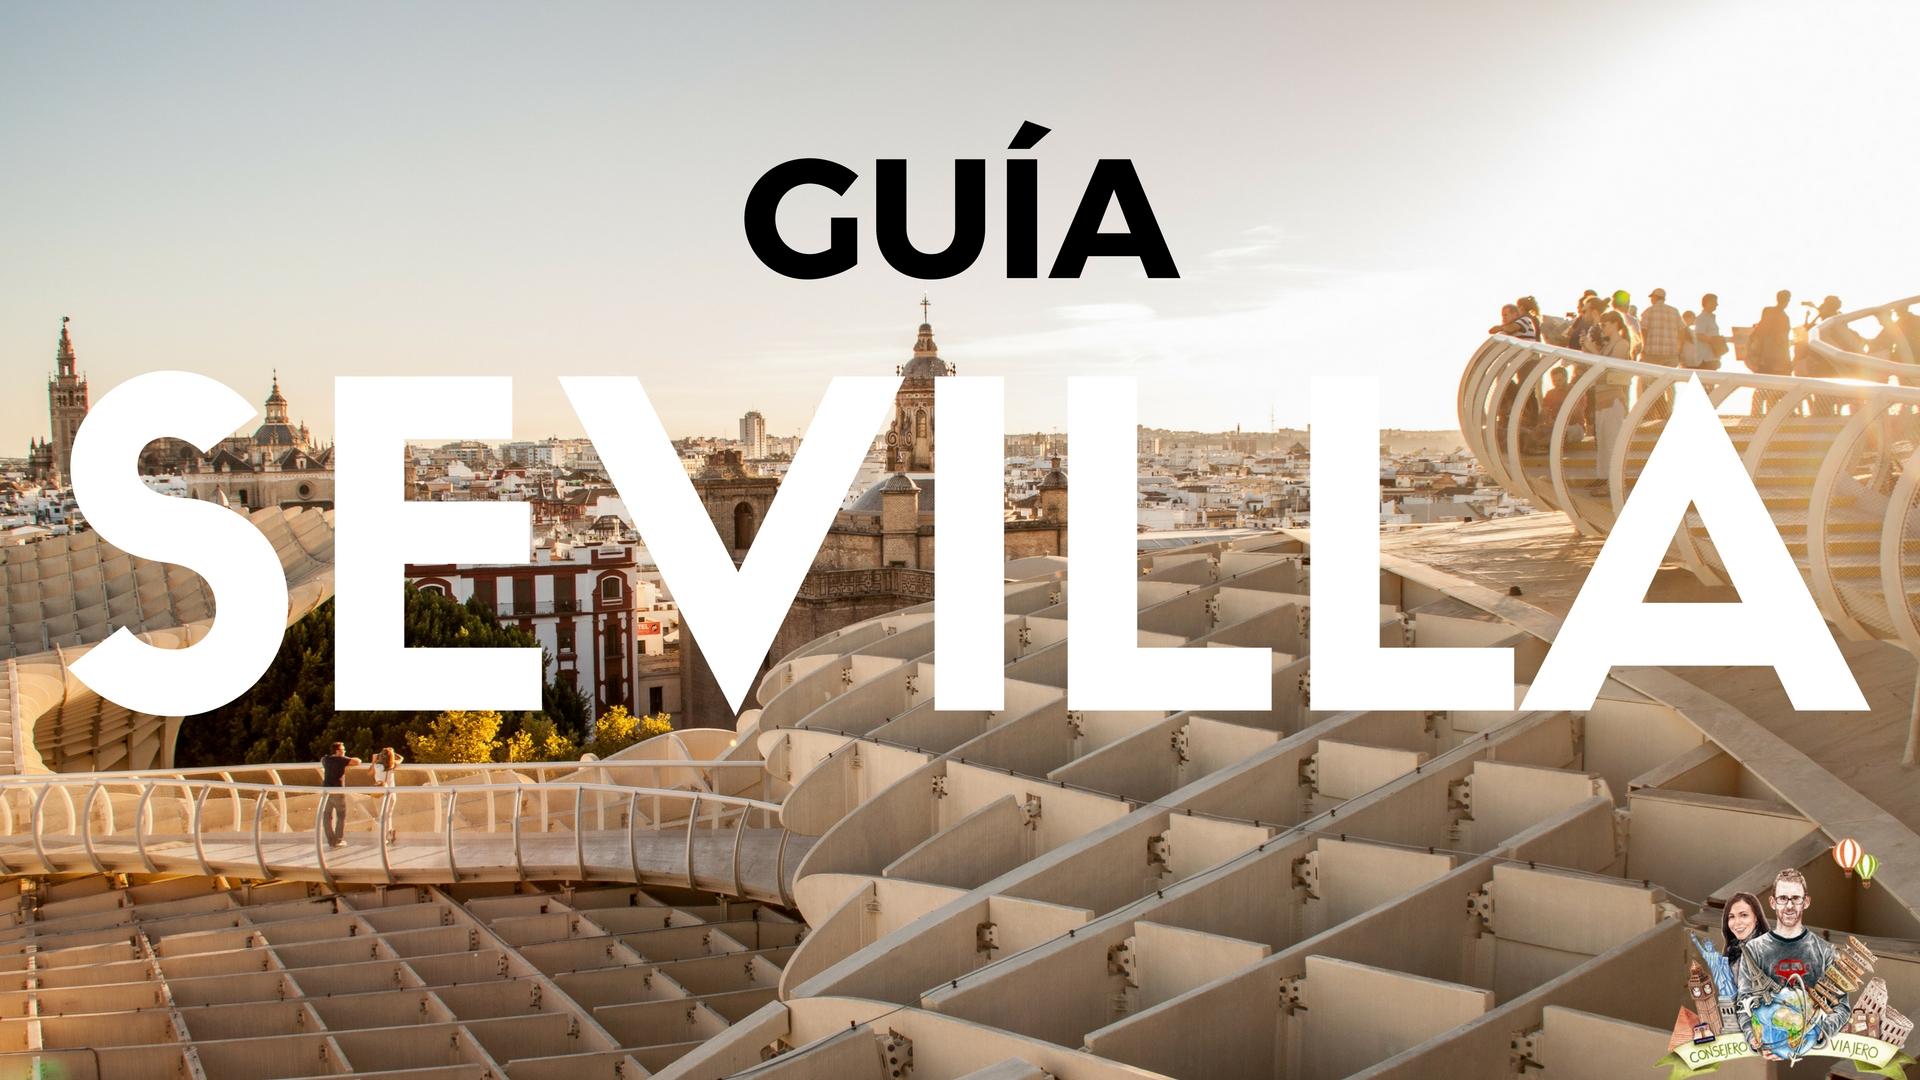 Guía de Sevilla, información práctica para tu próxima visita